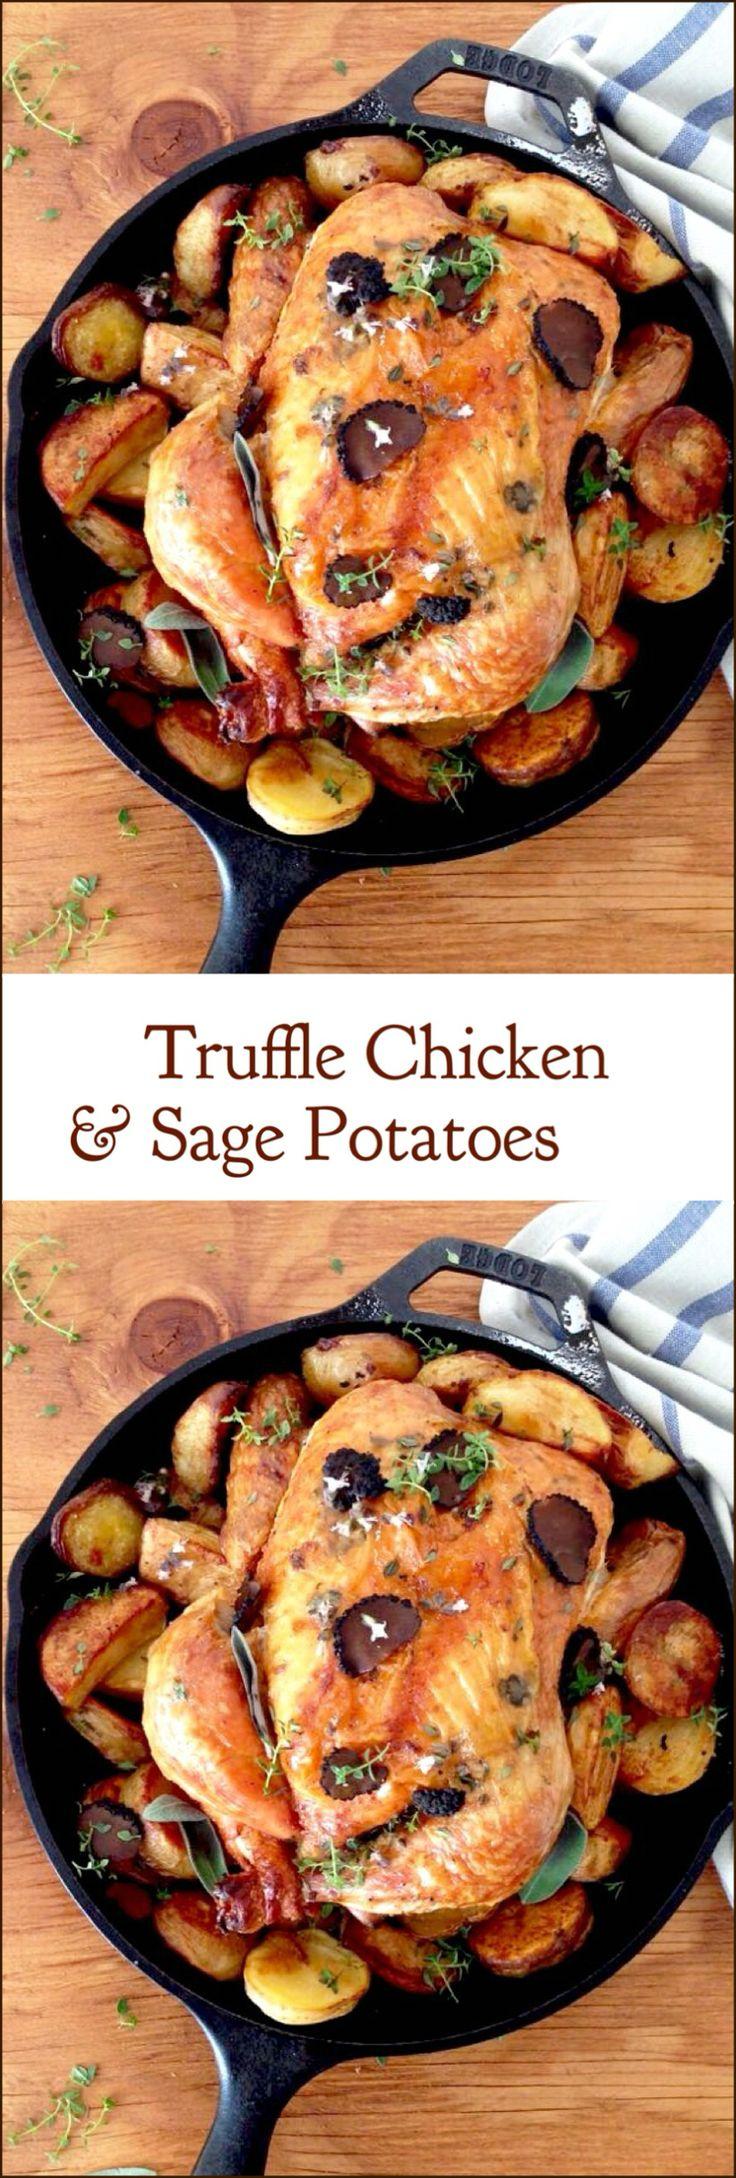 Roasted Truffle Chicken and Sage Potatoes Recipe | CiaoFlorentina.com @CiaoFlorentina